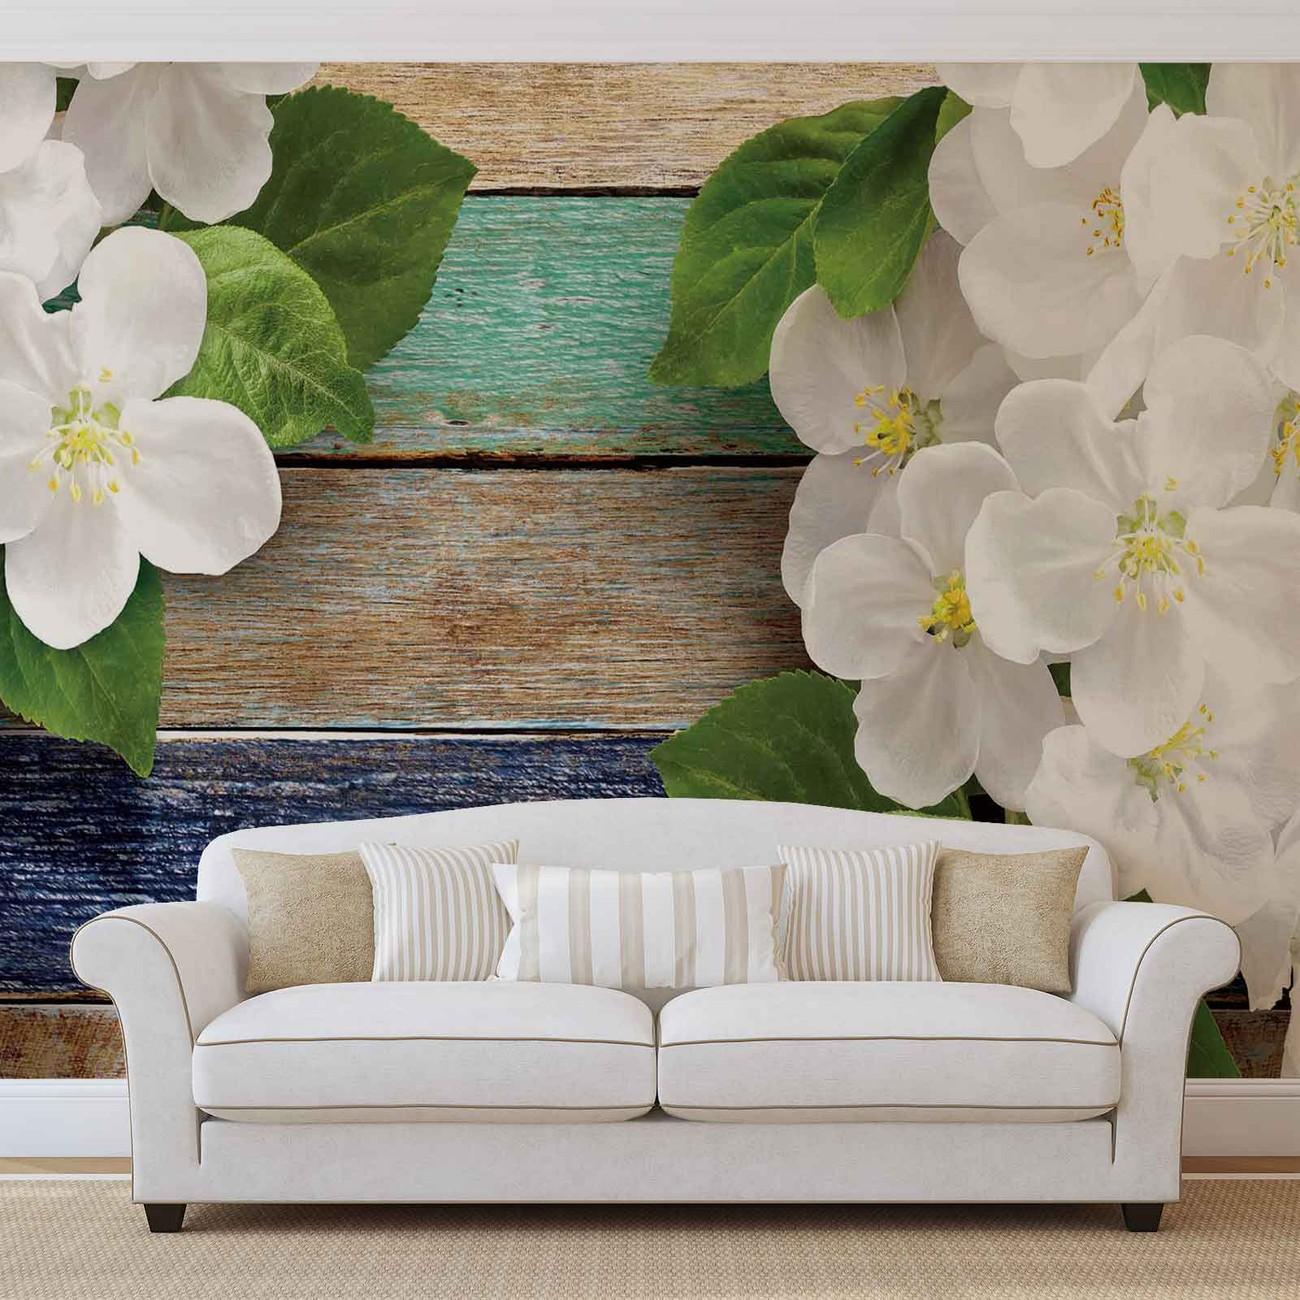 fototapete tapete holz zaun blumen bei europosters. Black Bedroom Furniture Sets. Home Design Ideas